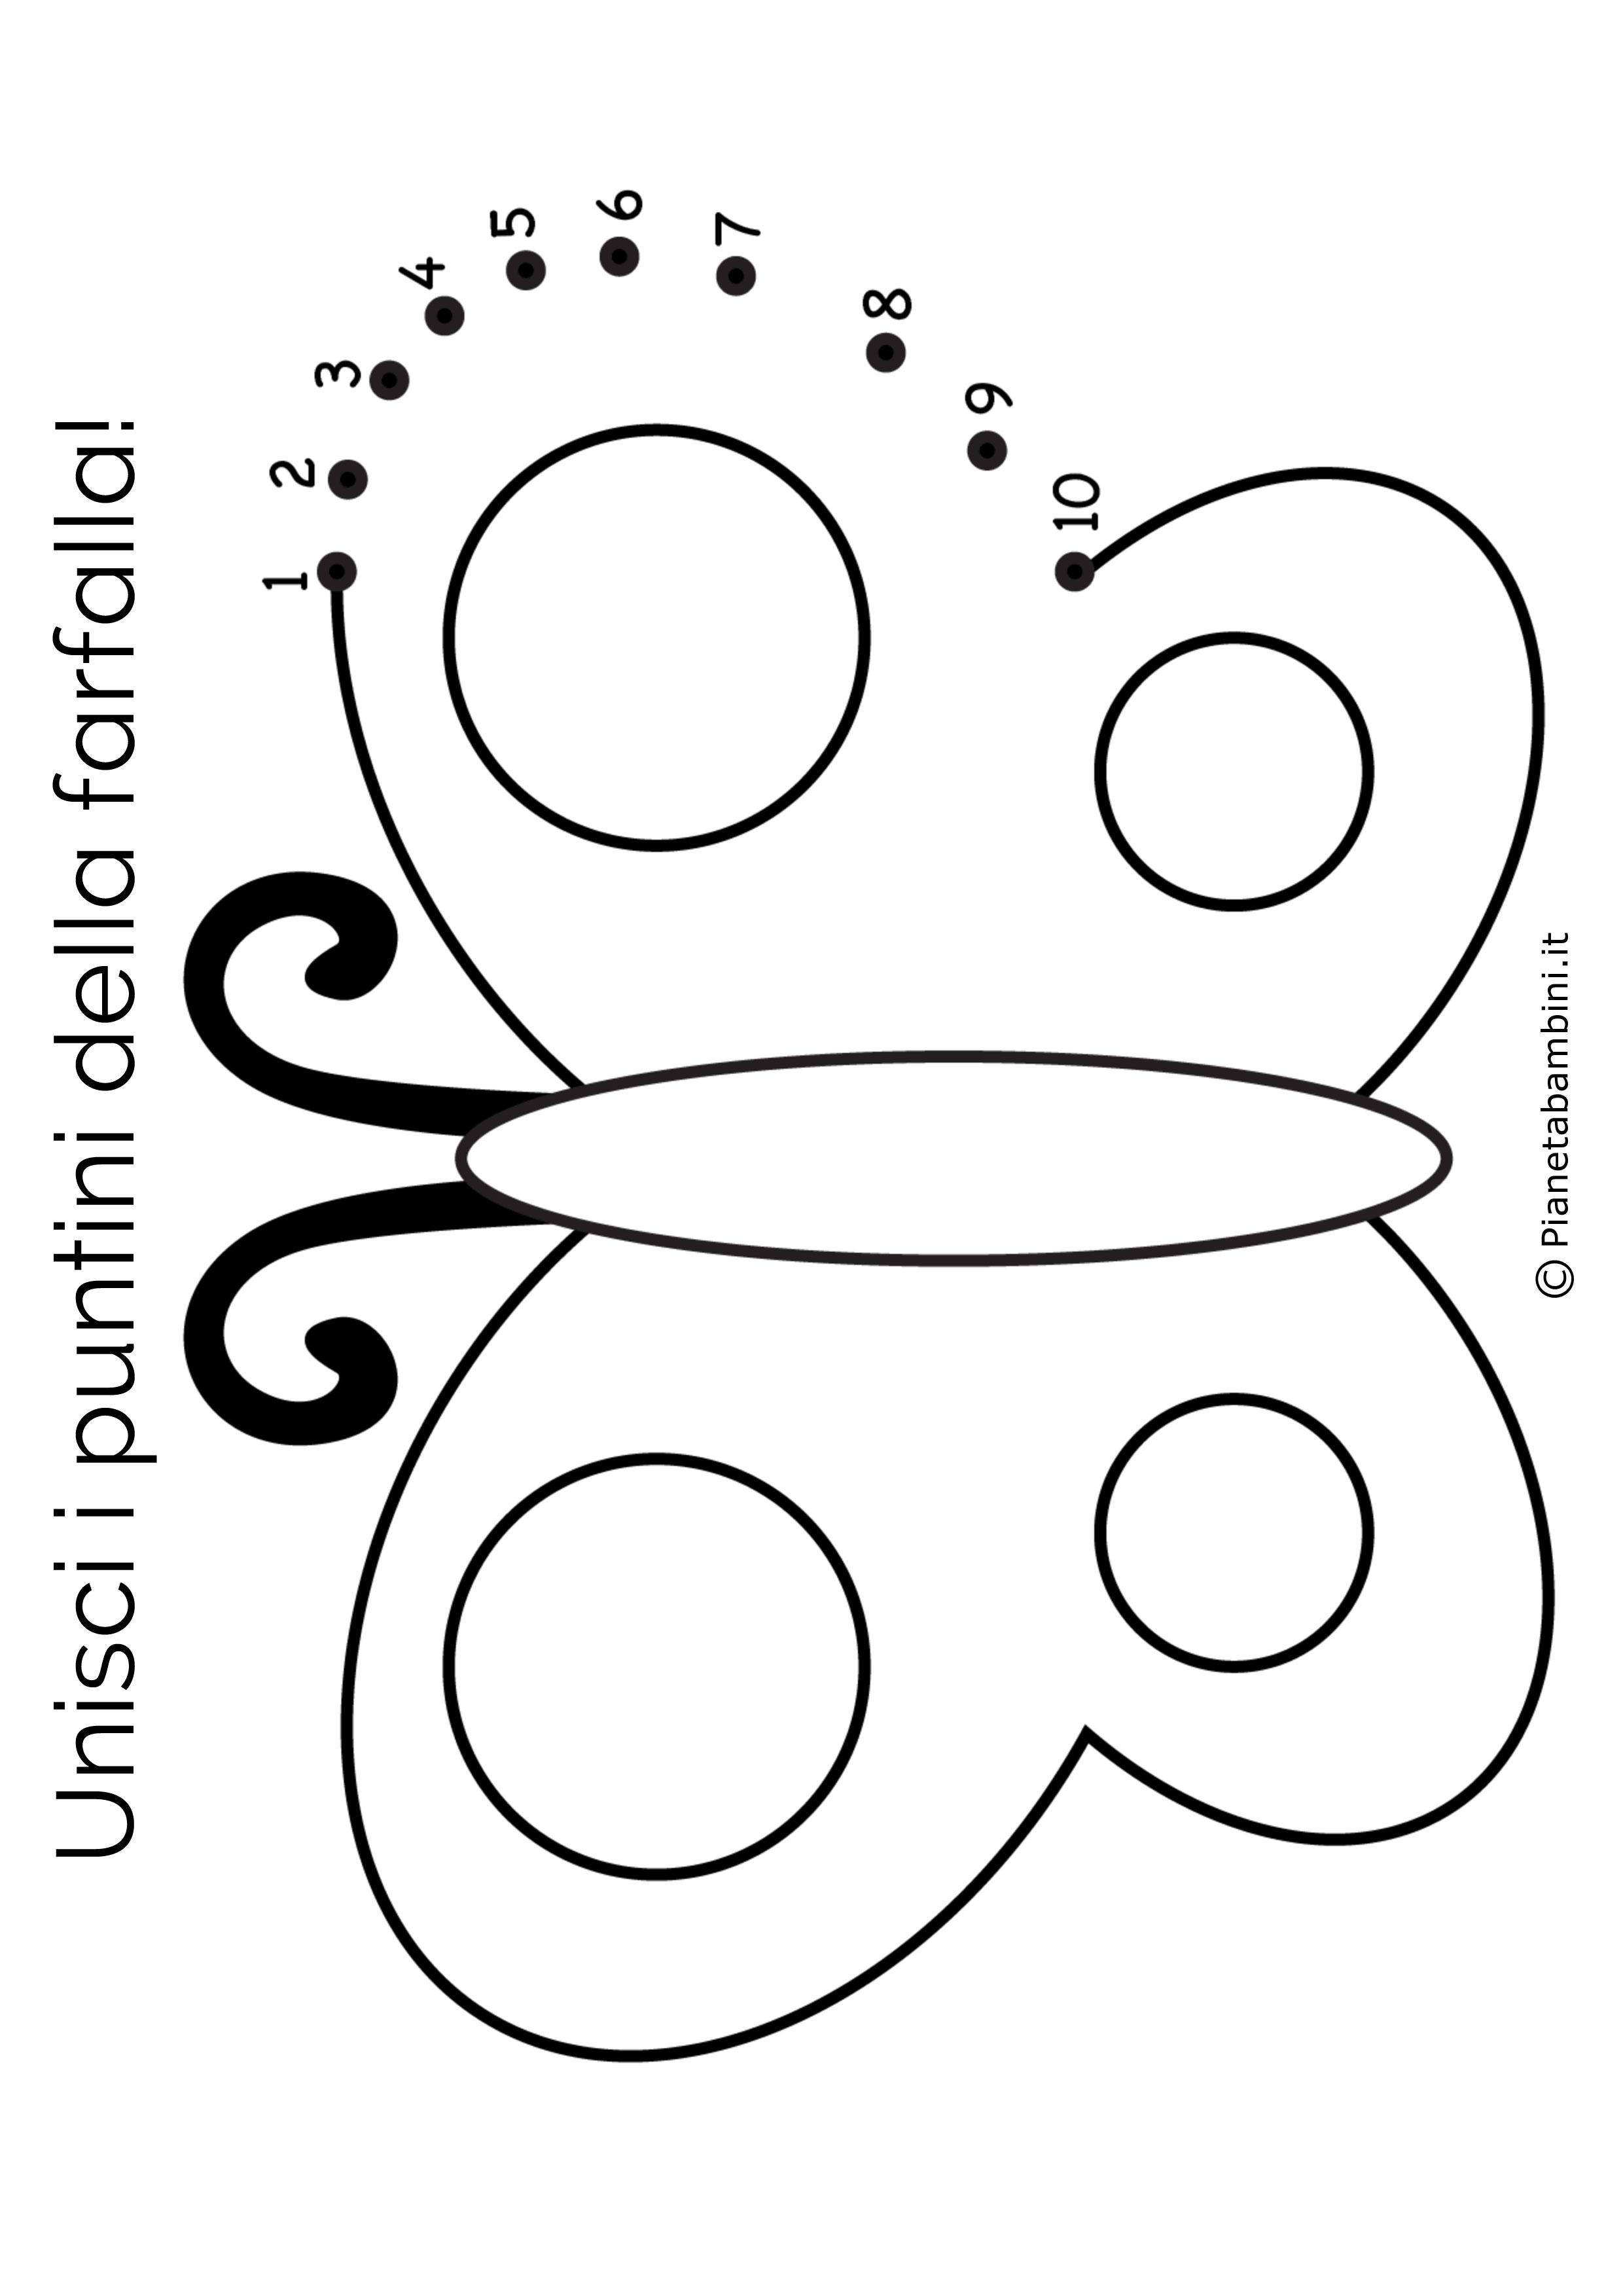 Disegno unisci i puntini farfalla